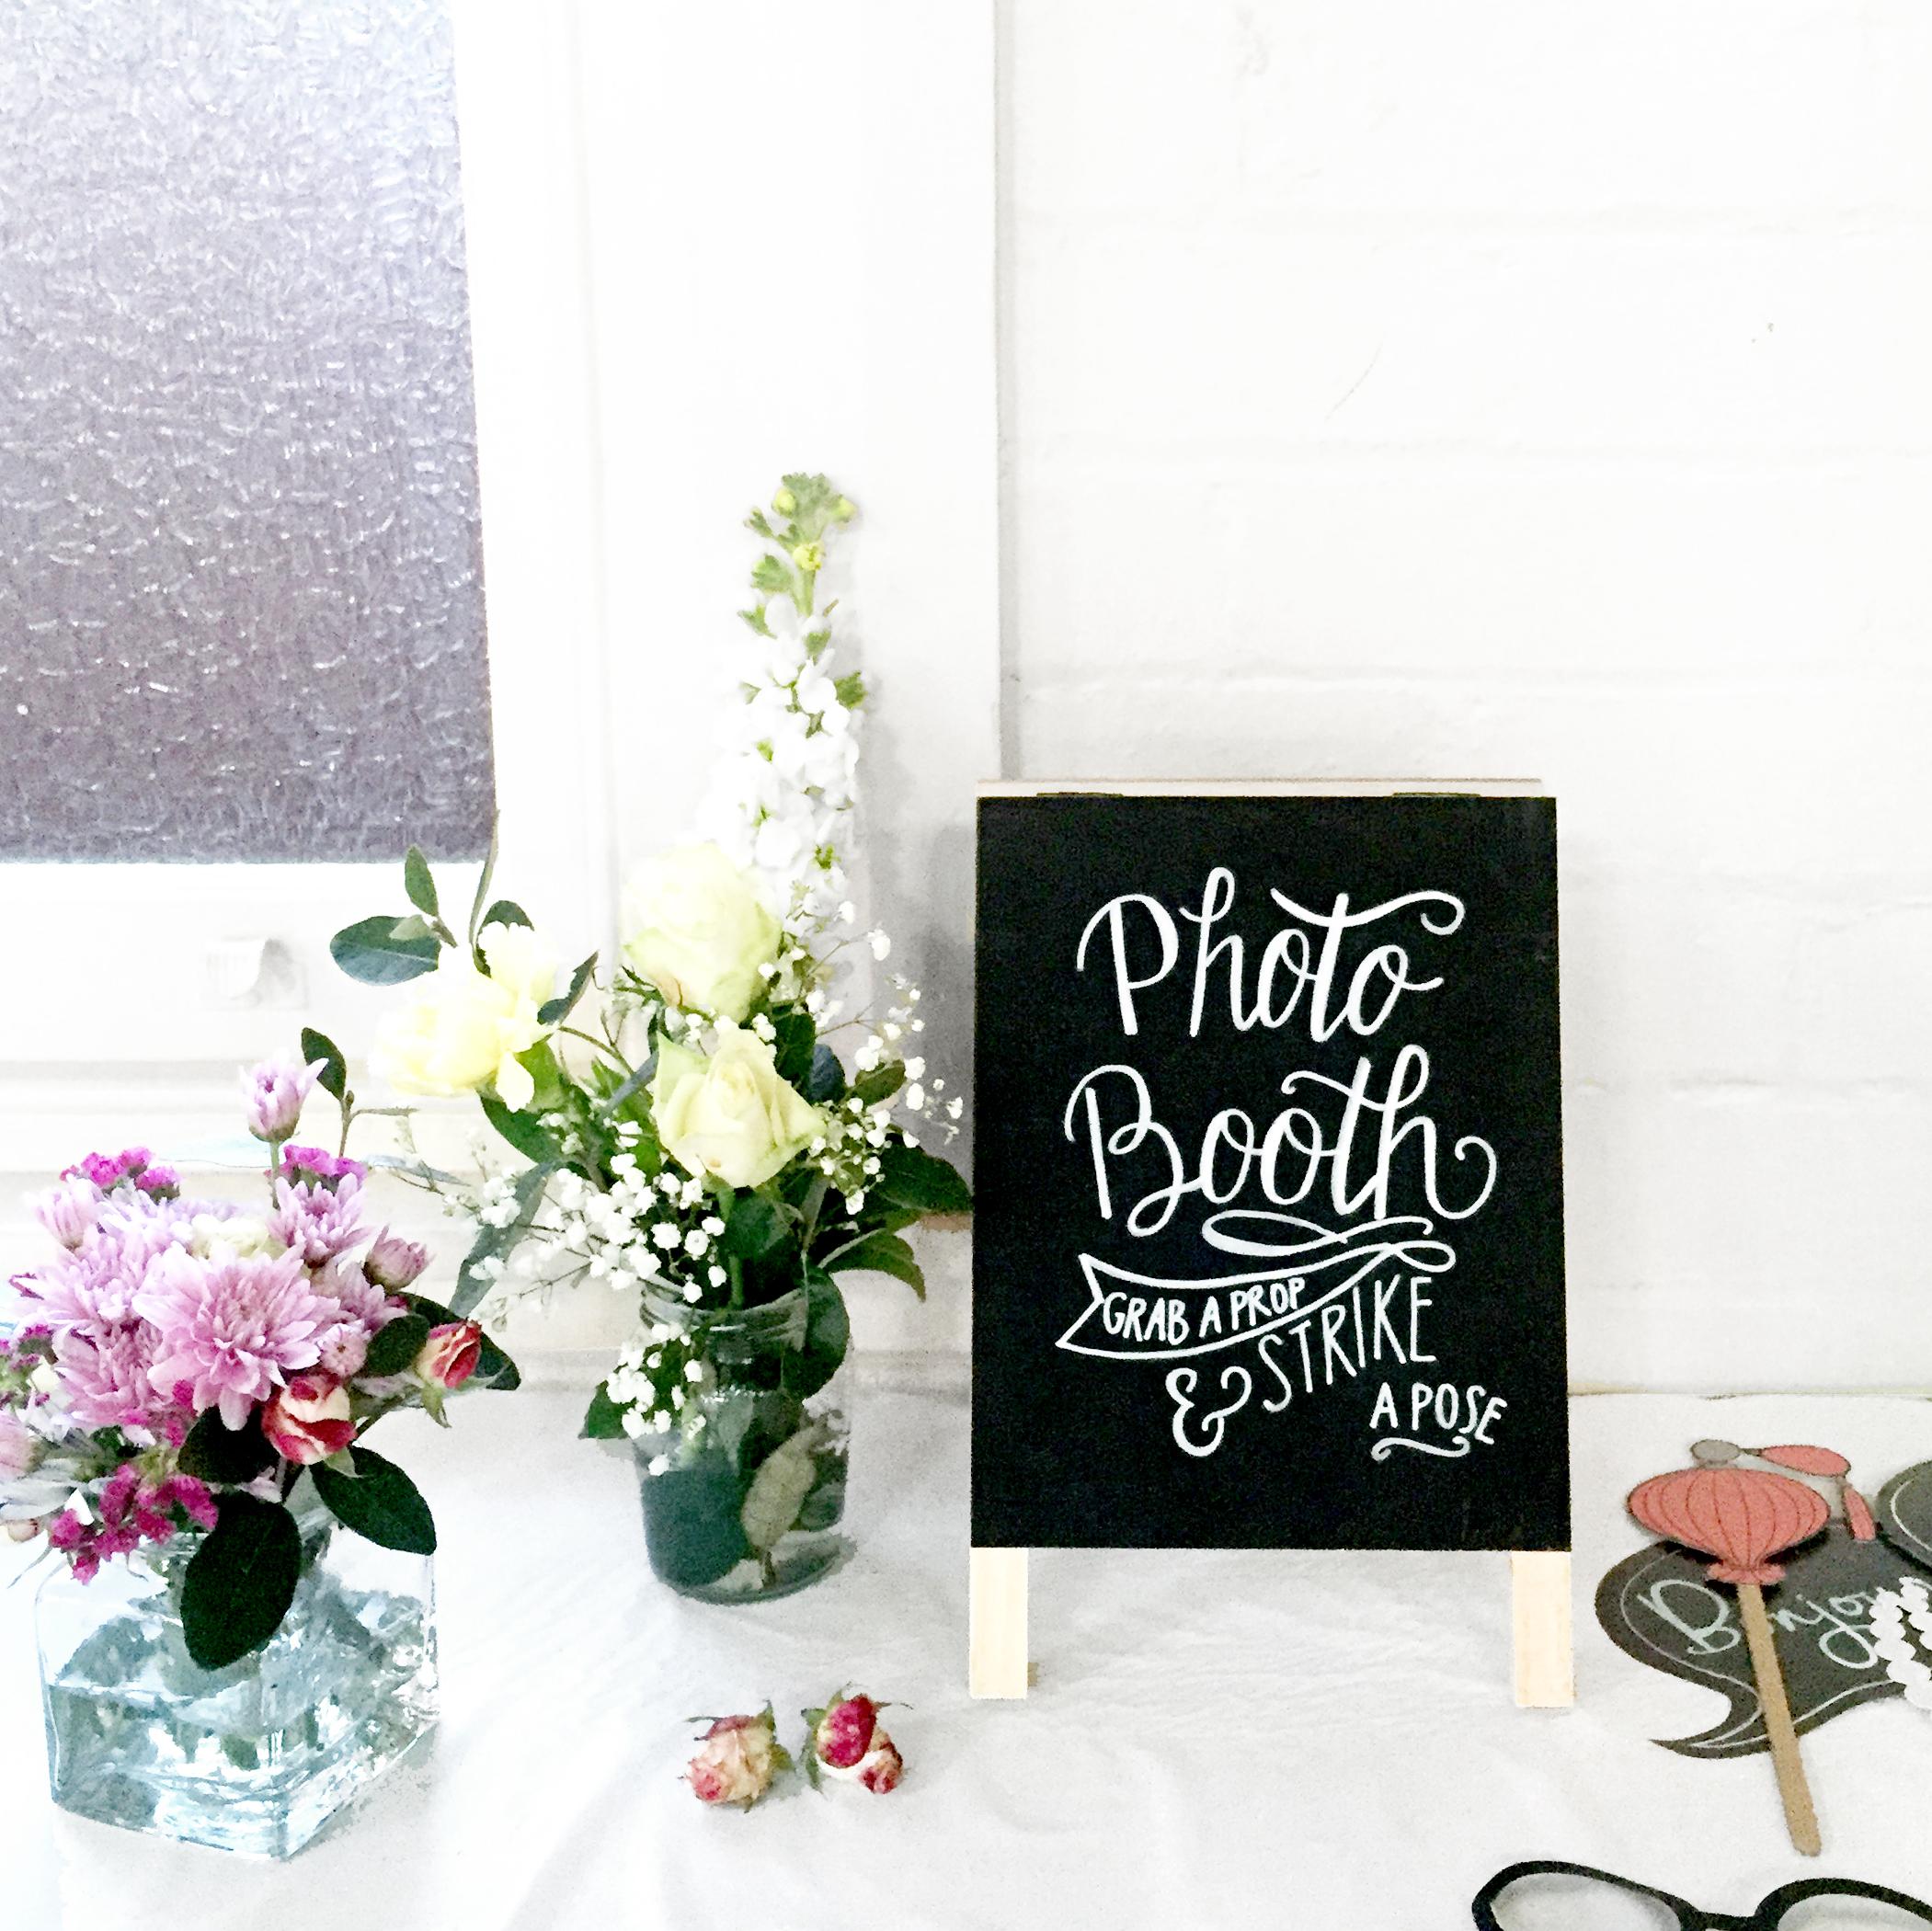 photobooth sign.jpg